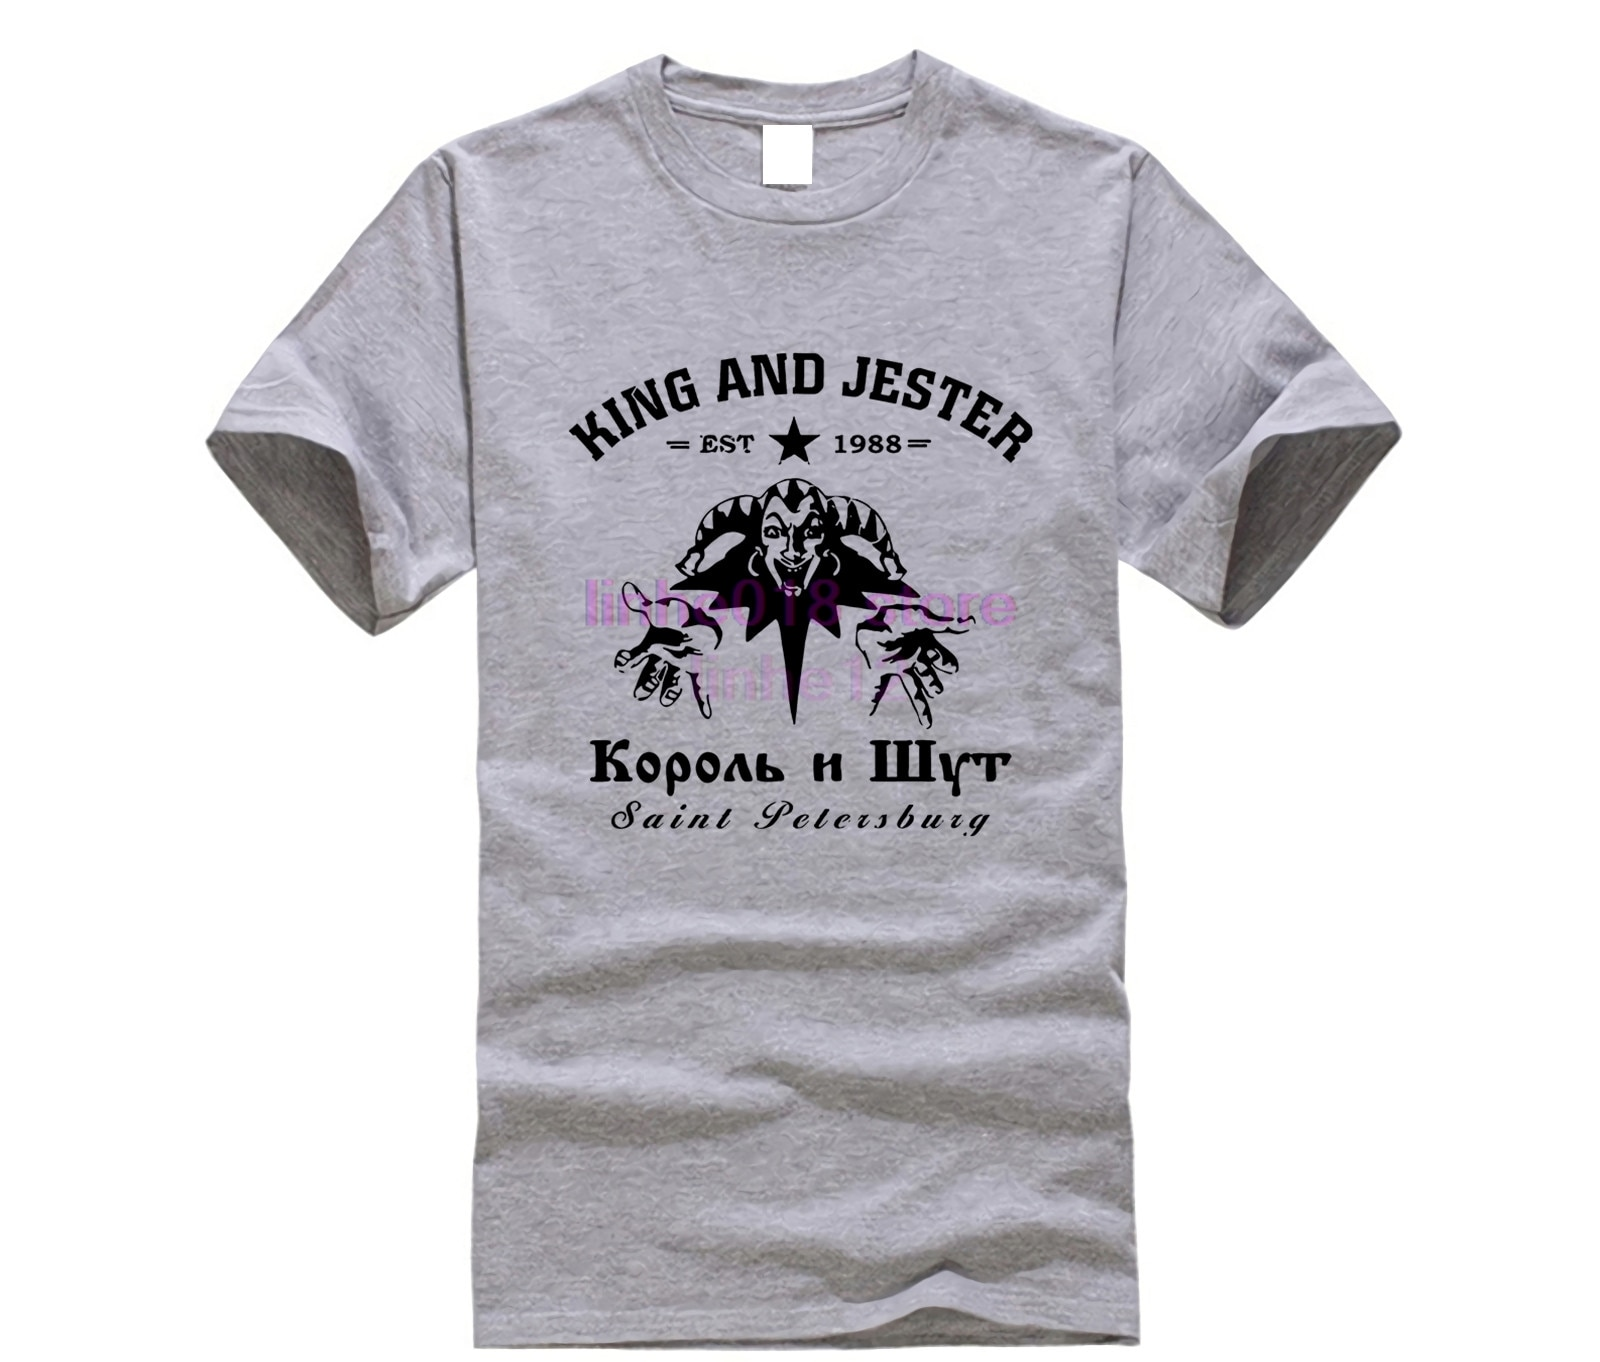 Envío Directo de camiseta de Korol ruso I Shut, camiseta de concierto para Fans de banda Punk Shock, camiseta de rey y bufón, camiseta de Rusia Rock mercancia